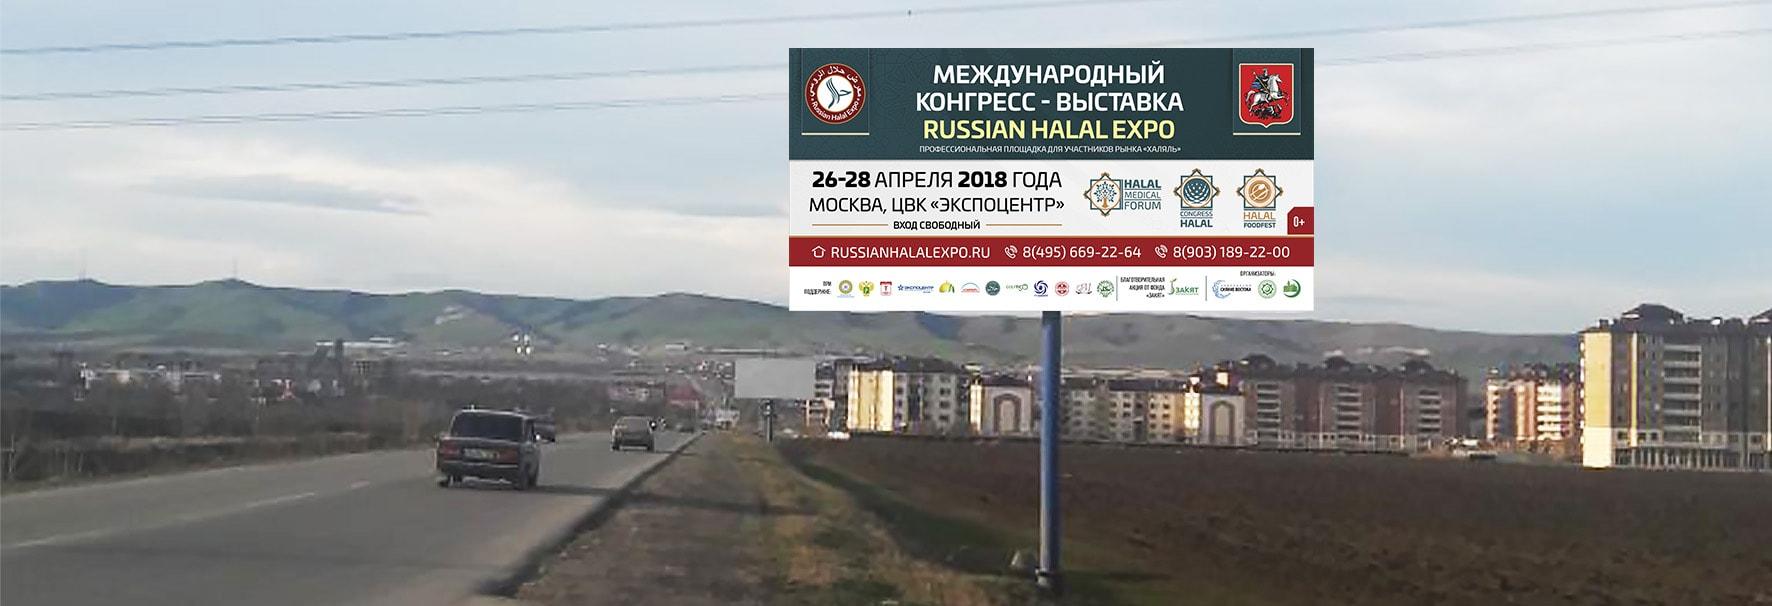 Реклама на билбордах в Ингушетии Russian Halal Expo Назрань